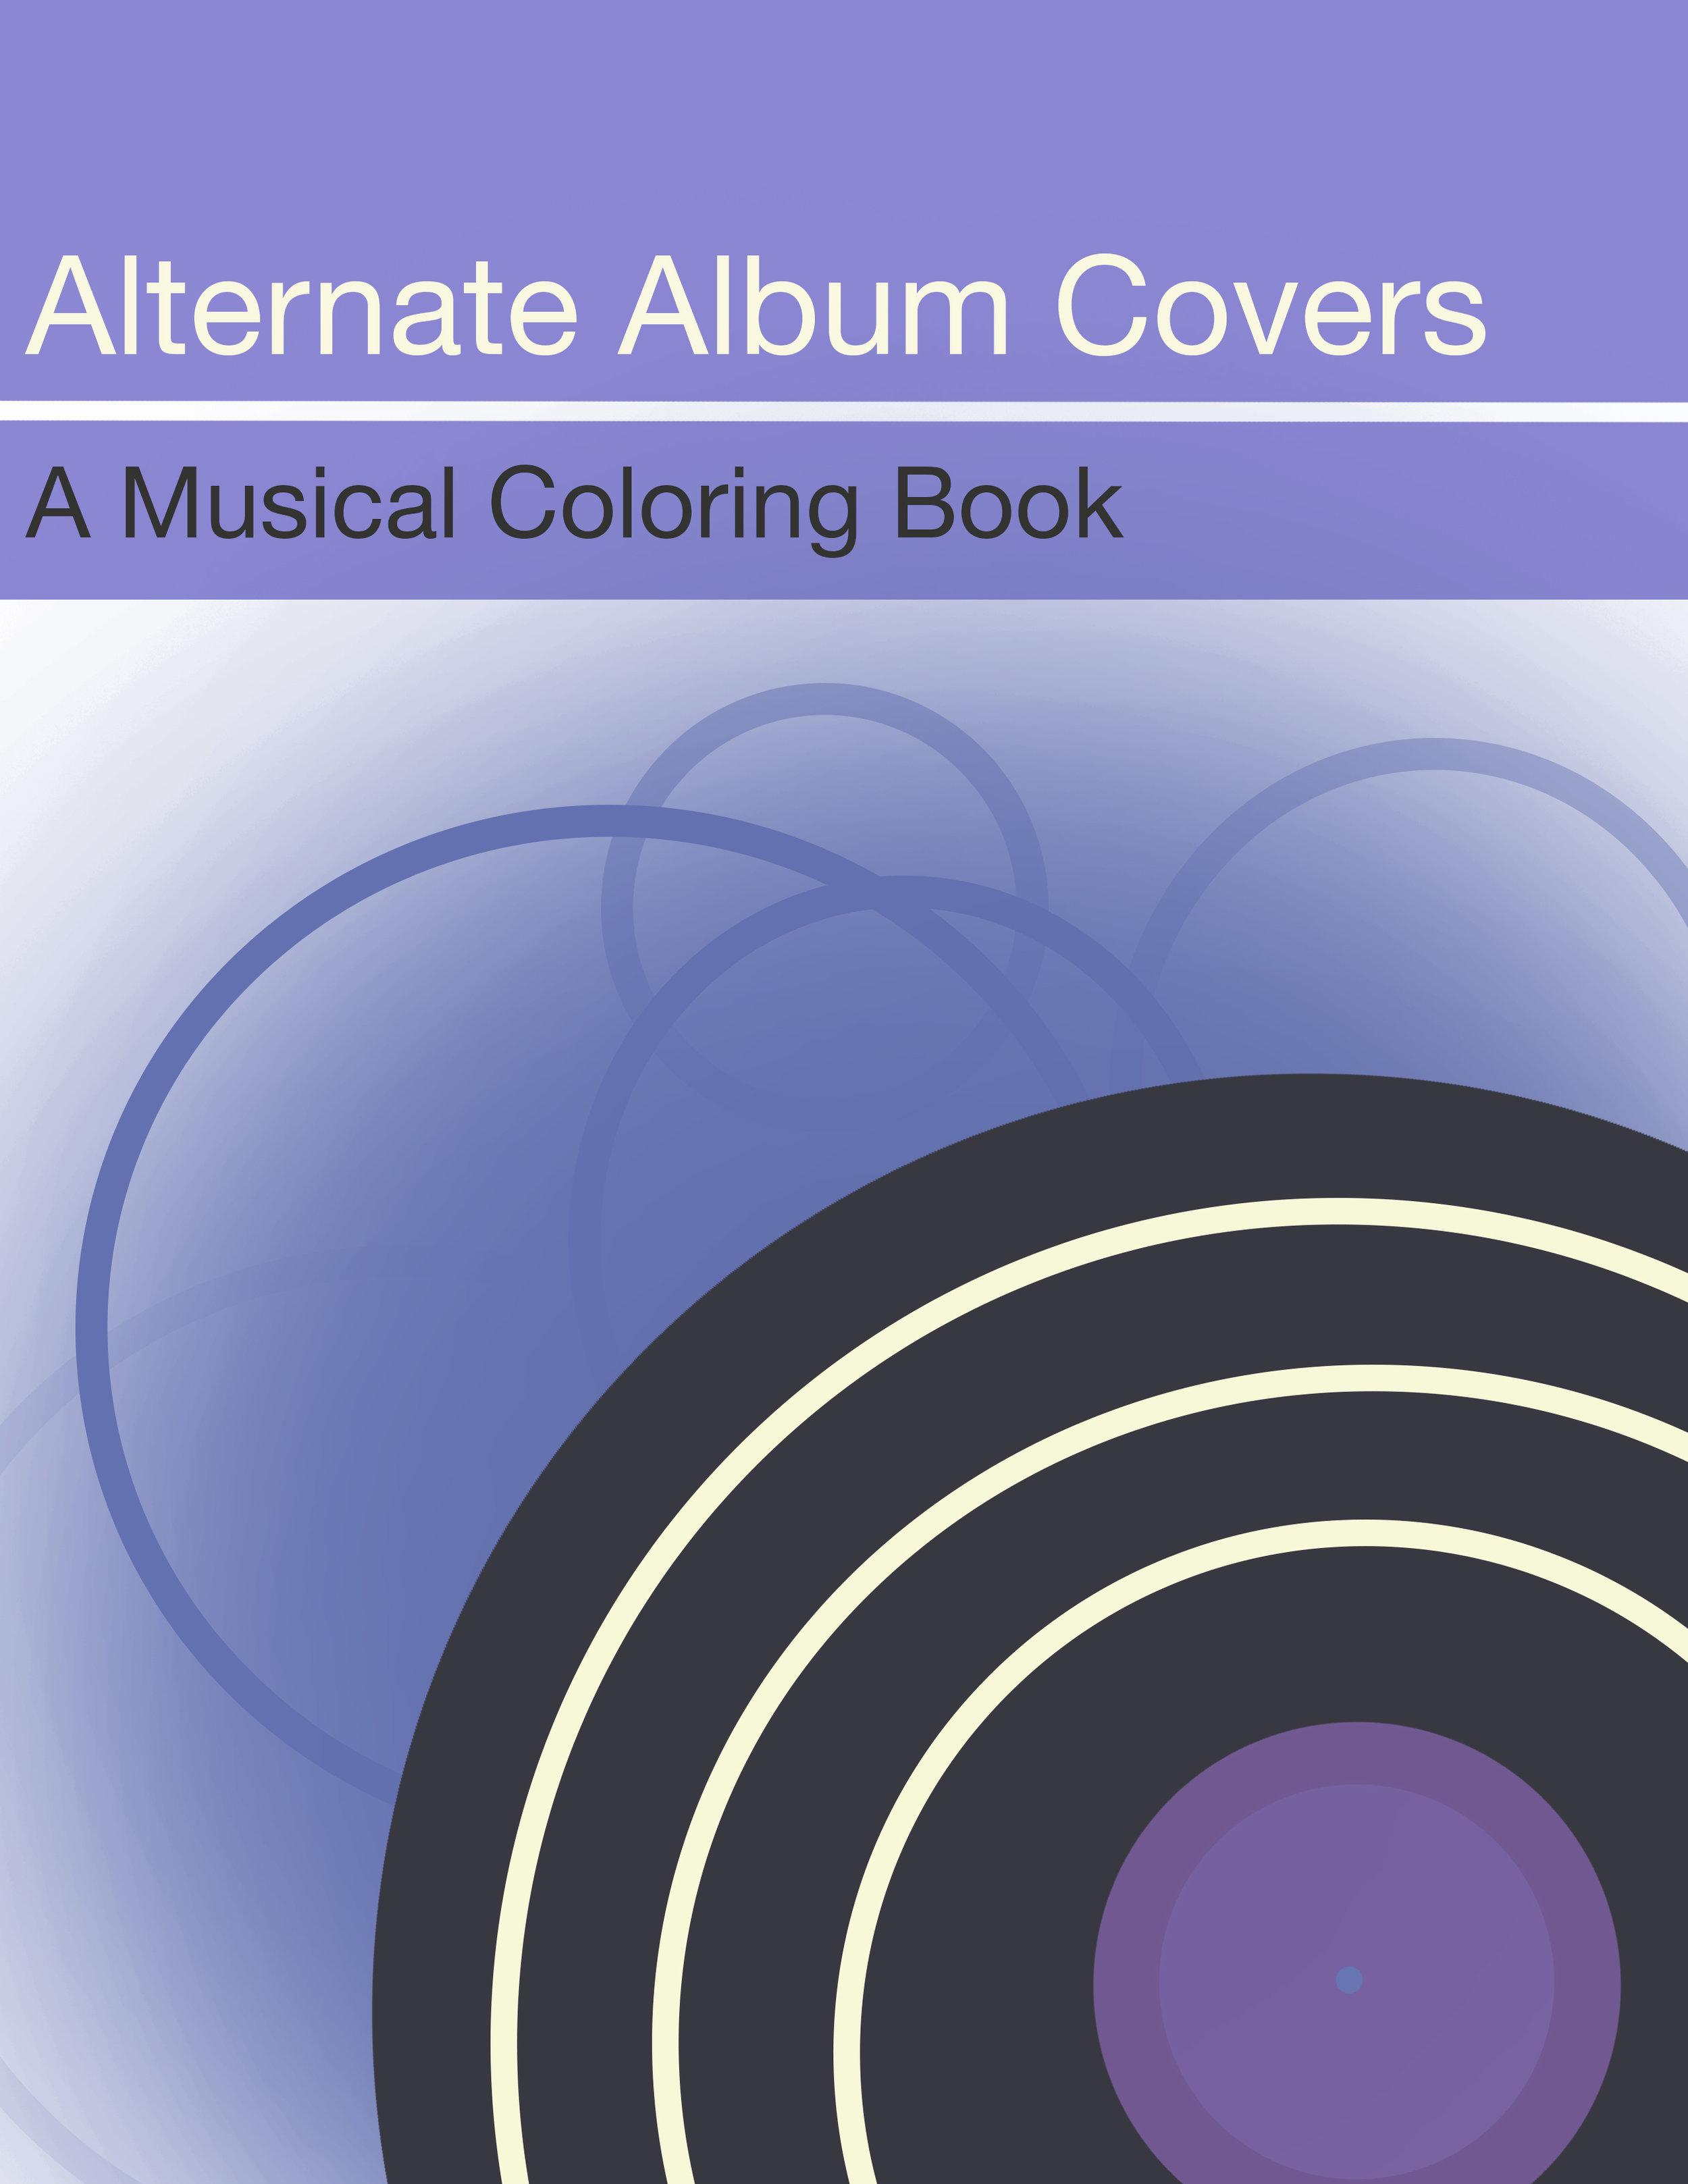 alternatealbums.jpg